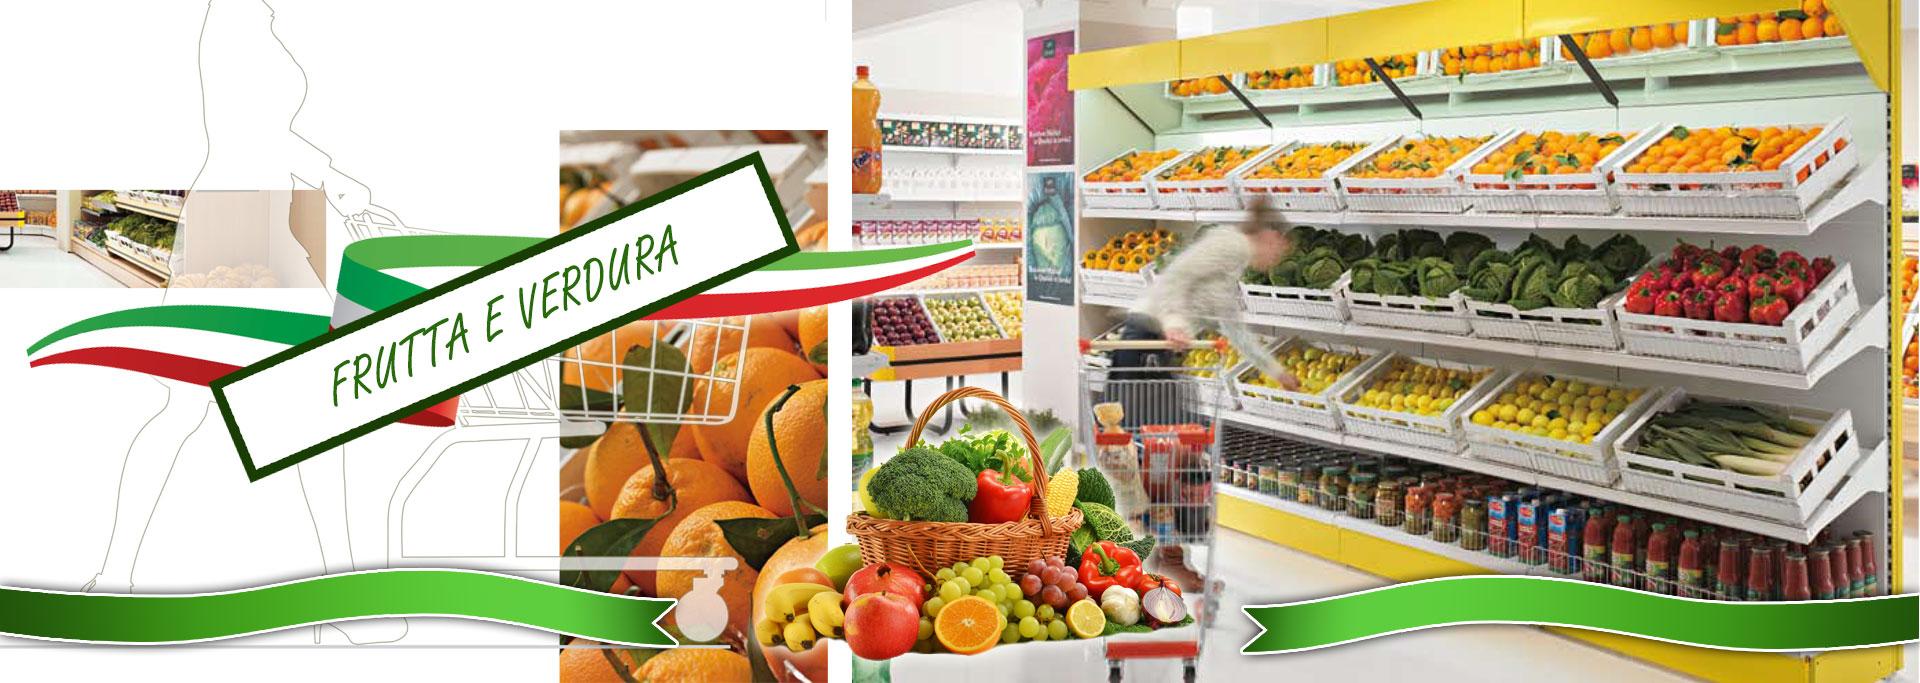 Scaffalature Per Negozi Alimentari.Arredamenti Per Negozi Di Frutta E Verdura Alimentari In Pronta